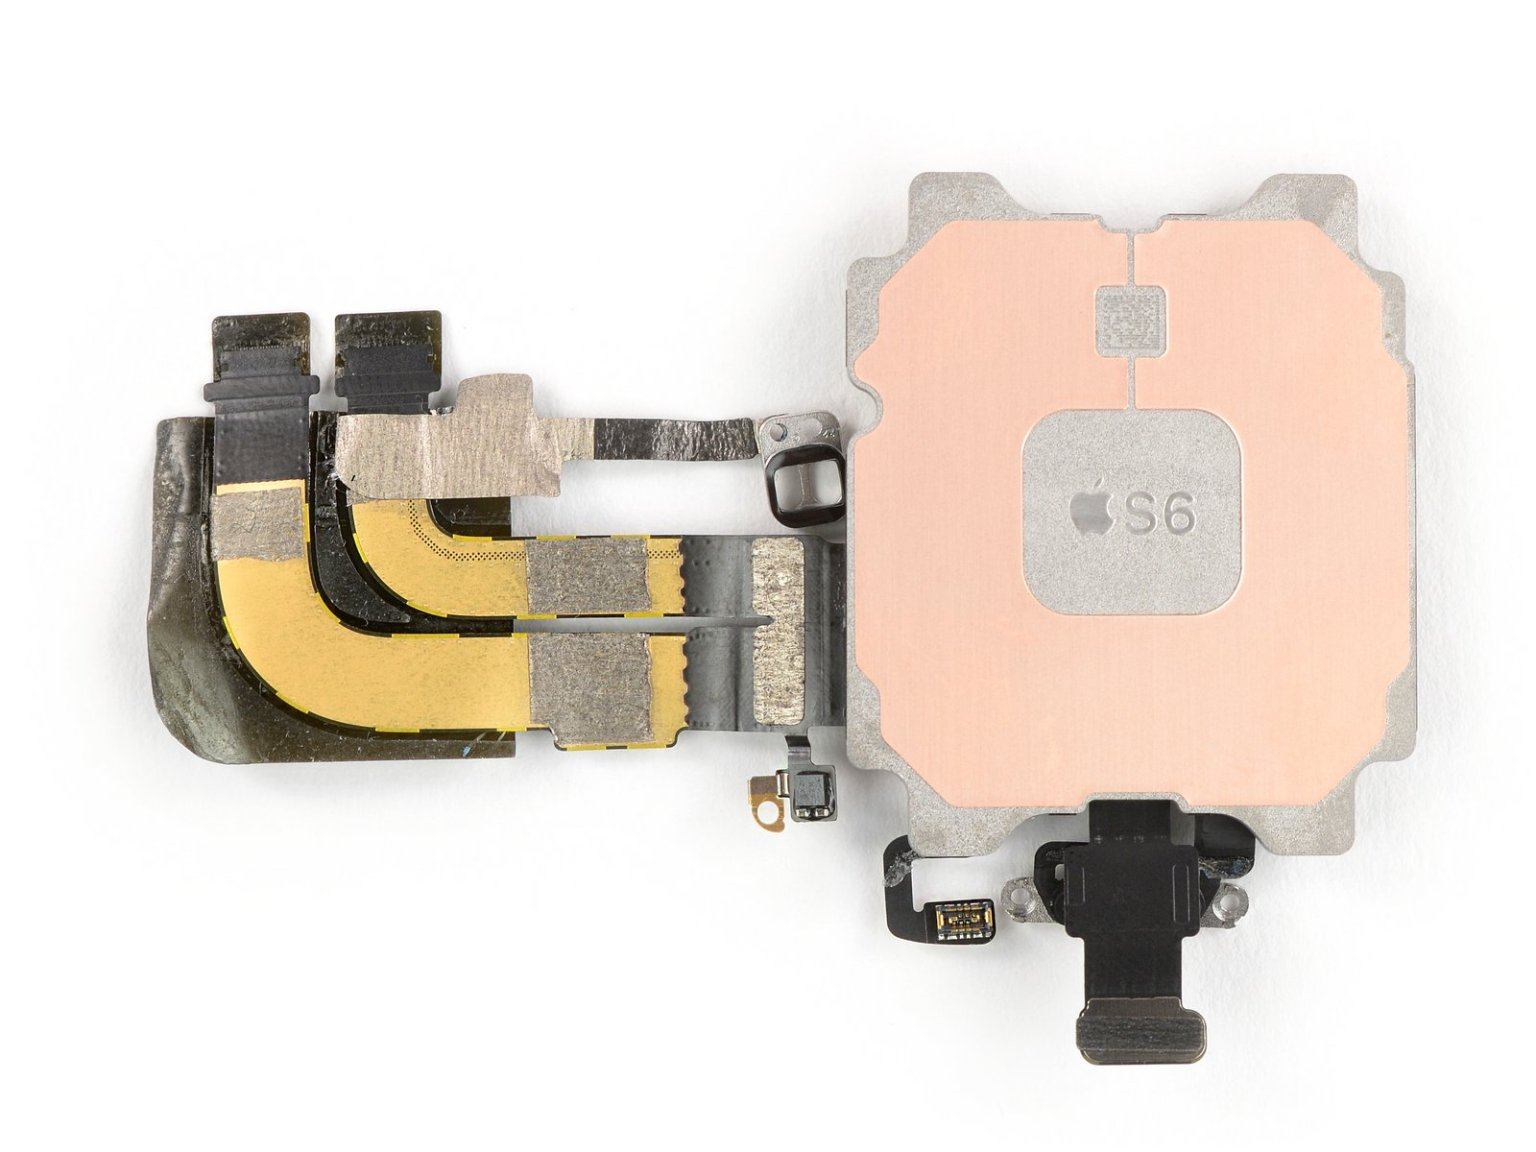 20200923.Apple-Watch-Series-6-teardown-reveals-bigger-battery-and-Taptic-Engine-slimmer-design-02.jpeg